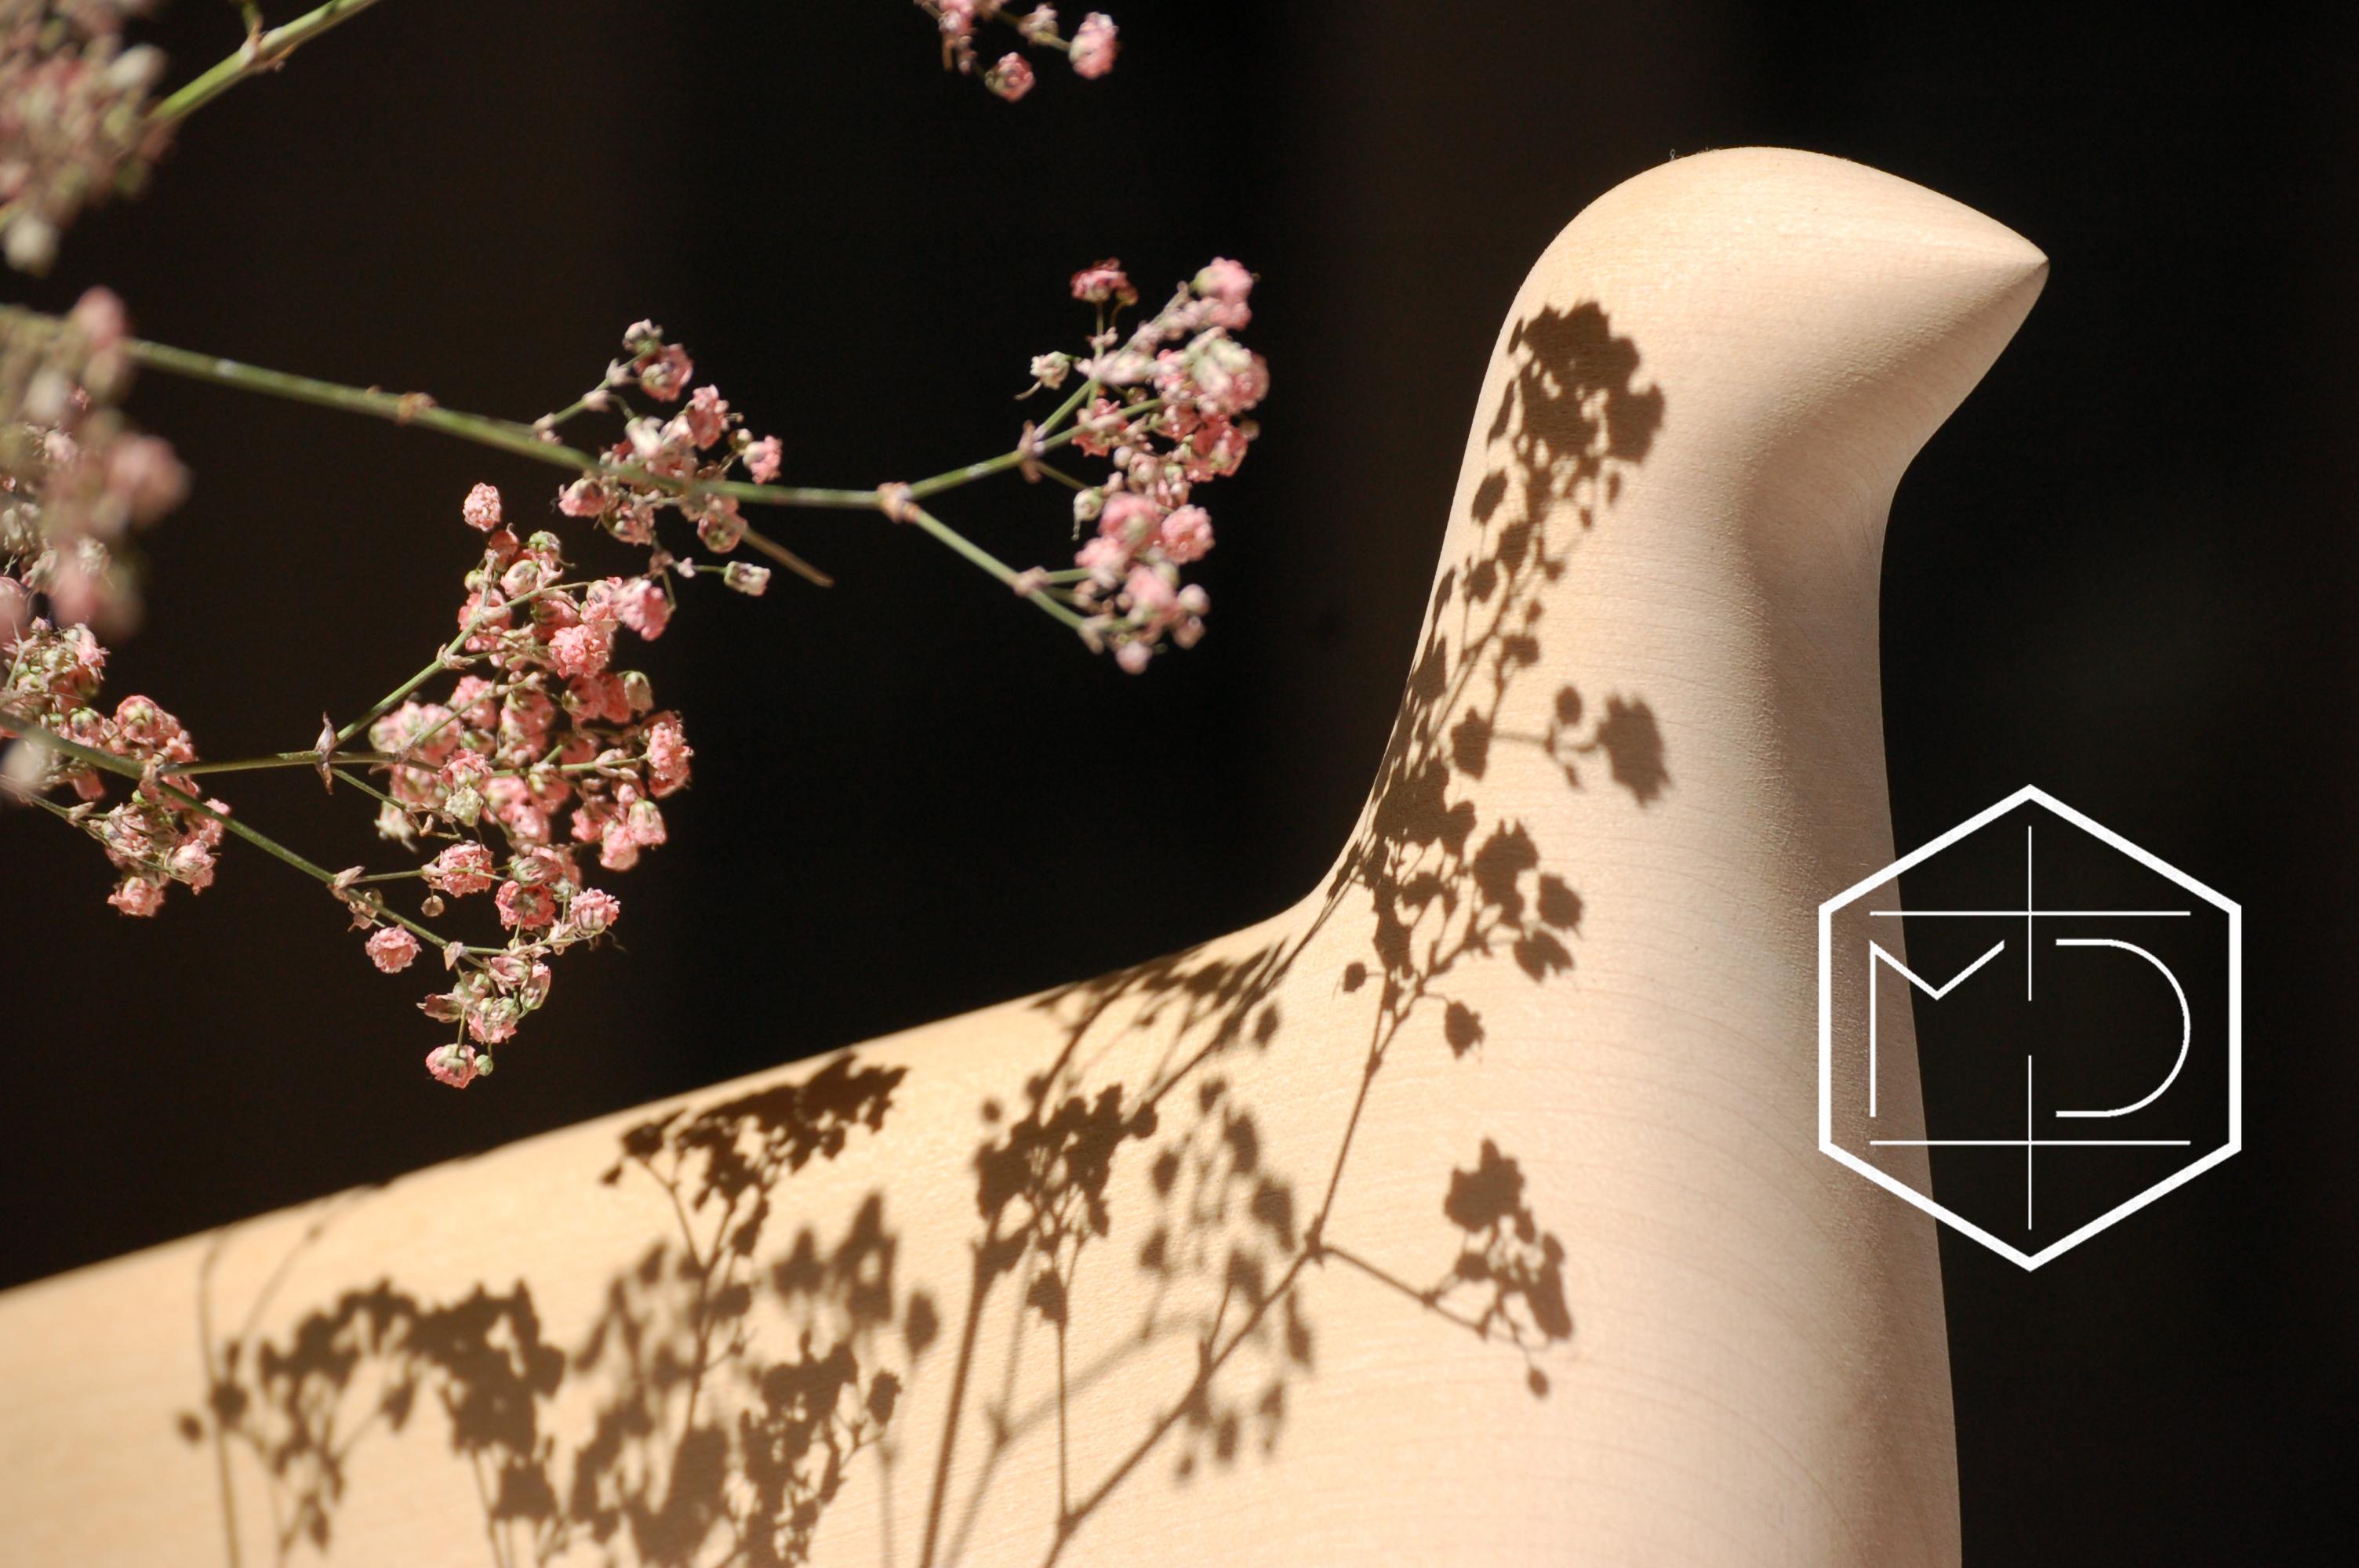 Mieke-Duindam-Interior-Design-interieurontwerp-advies-begeleiding (2)